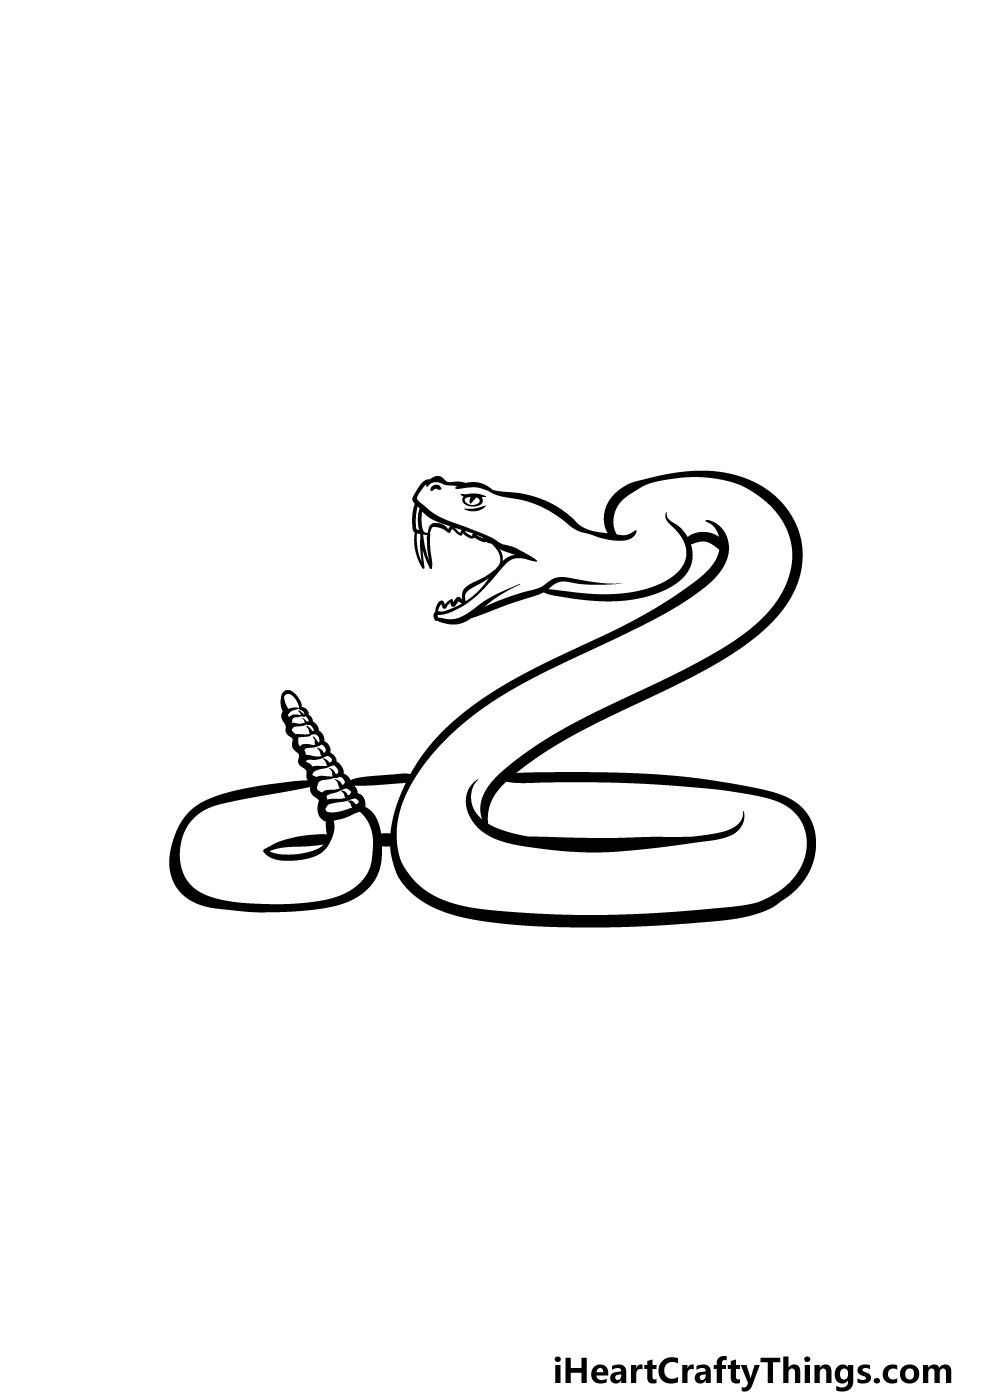 drawing a rattlesnake step 4